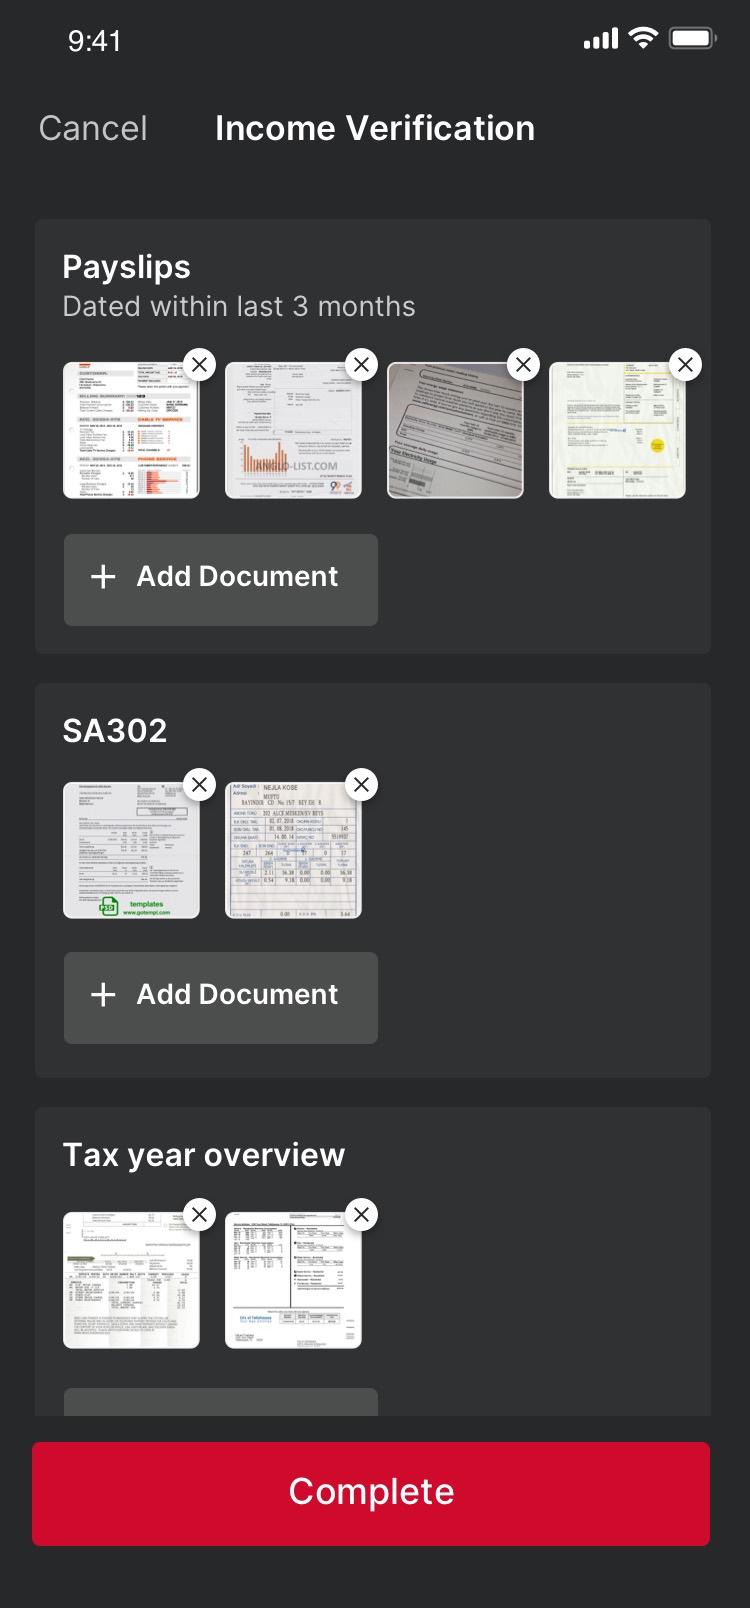 John Charcol App Document Upload